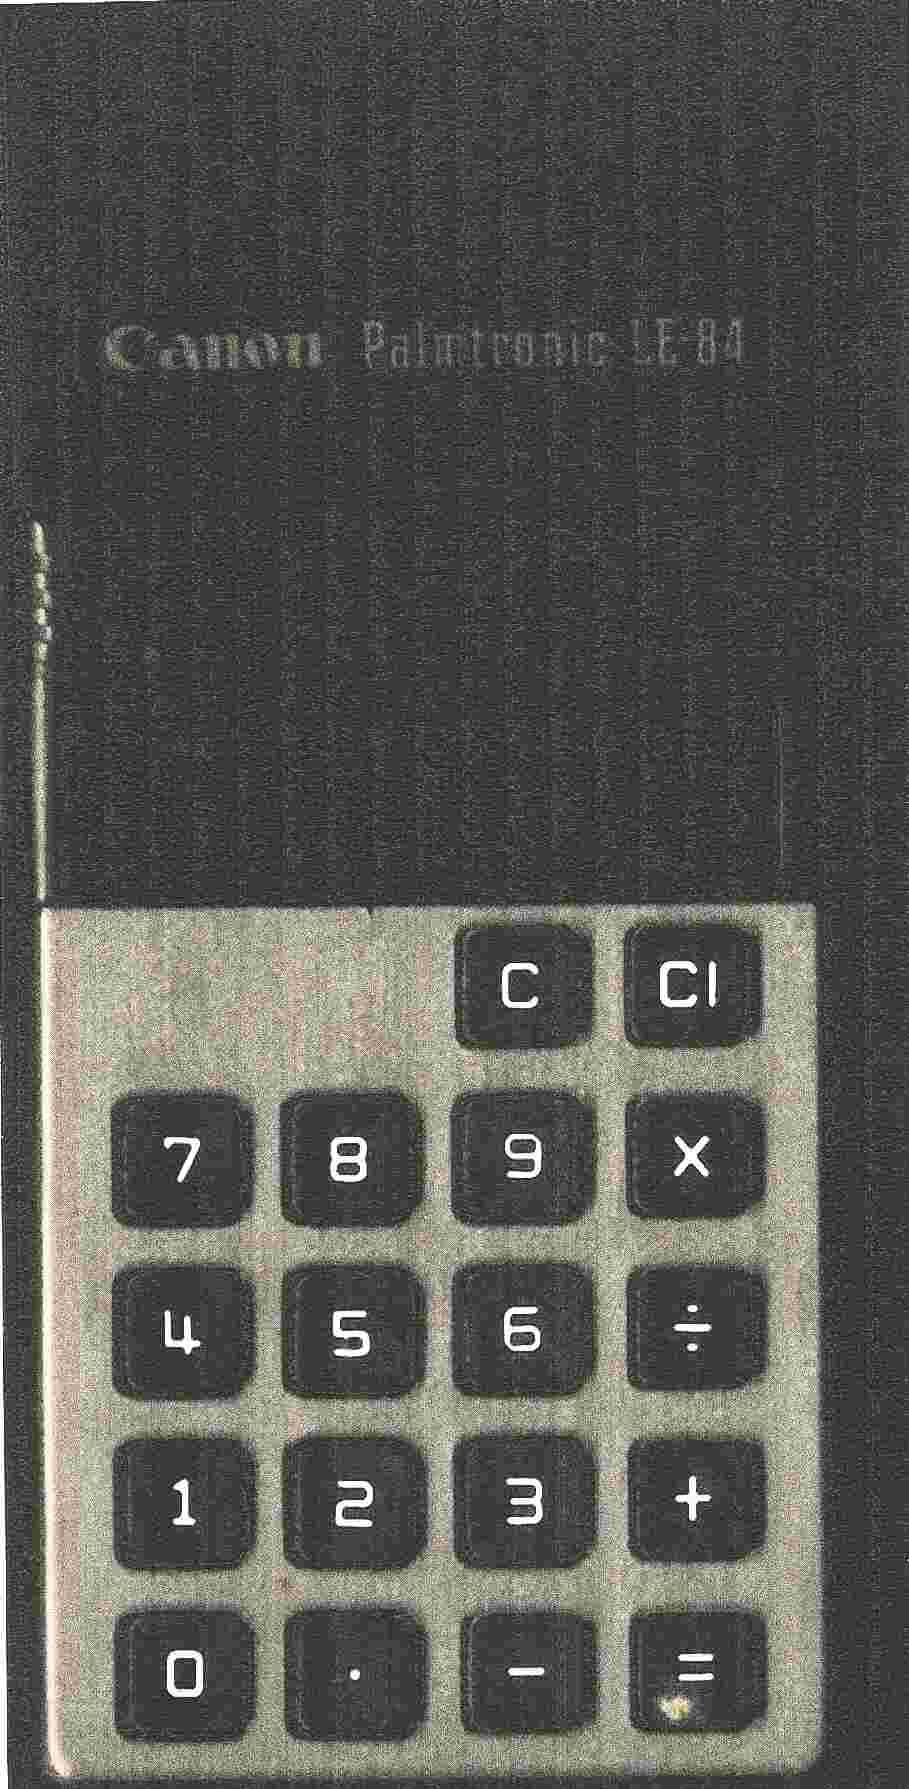 canon dc 20 manual pdf